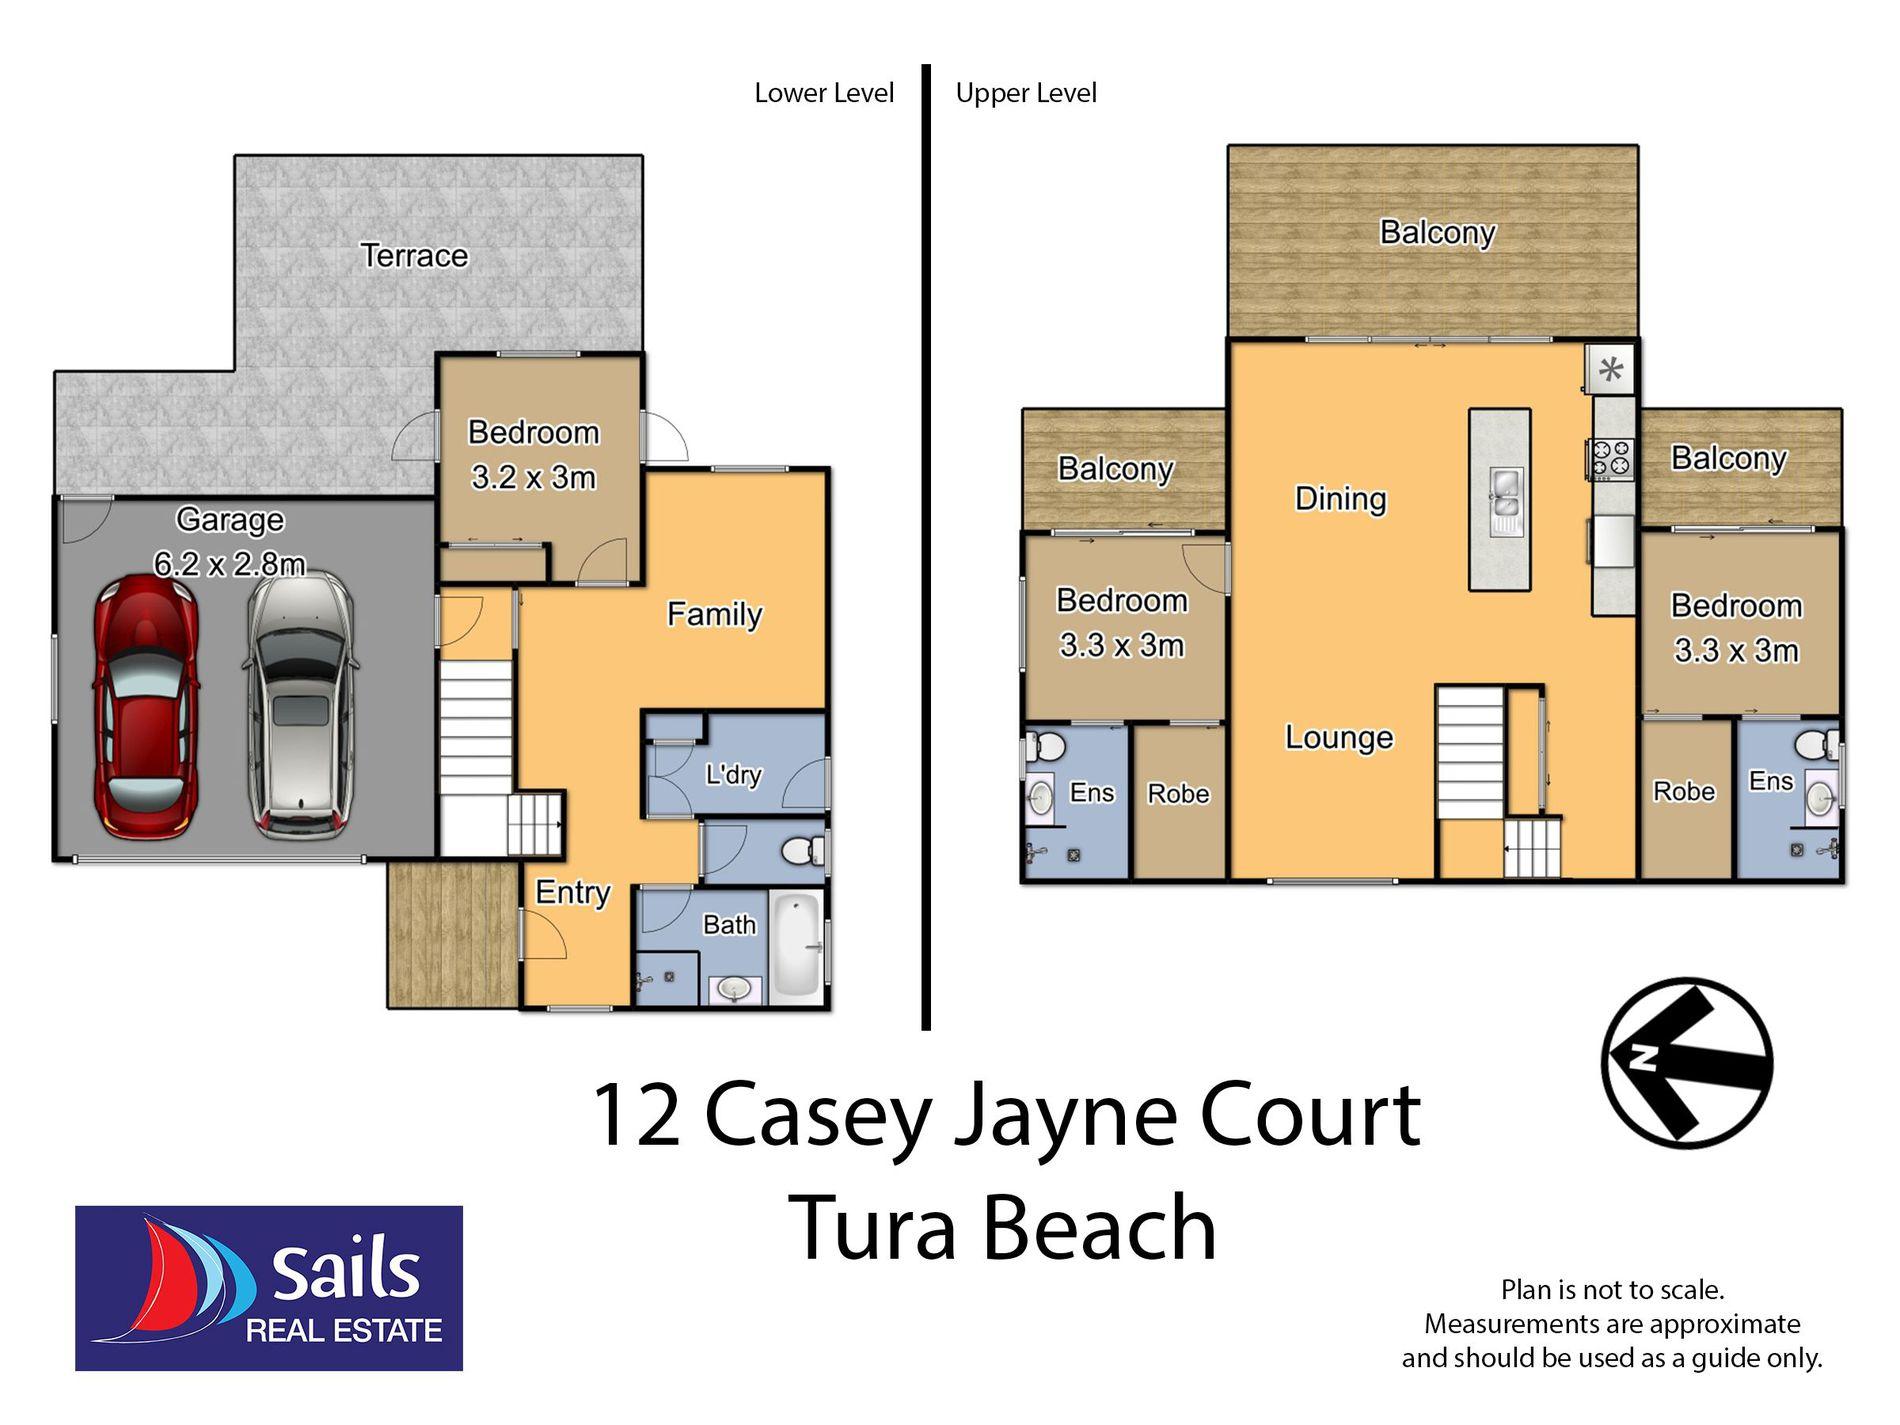 12 Casey Jayne Court, Tura Beach